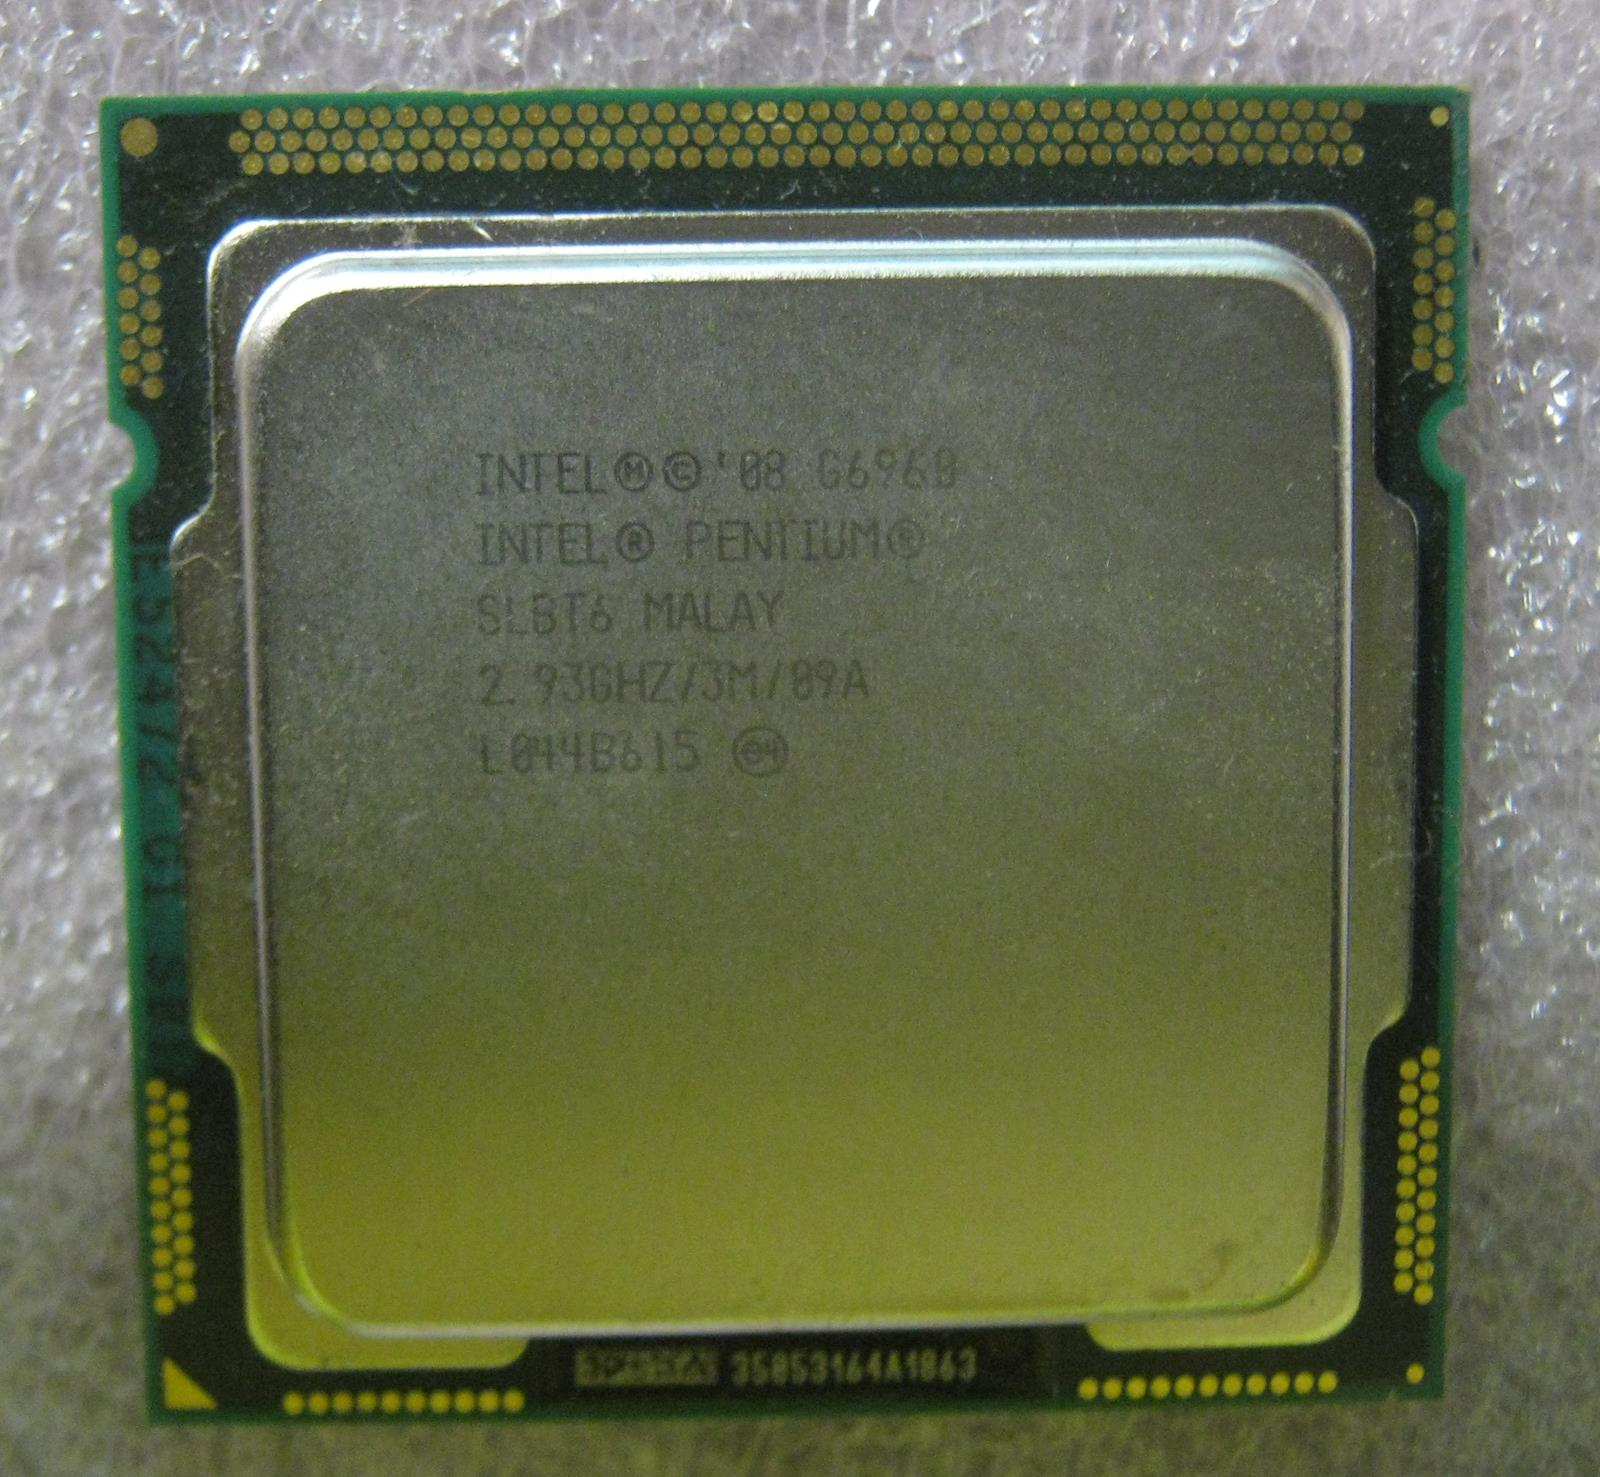 intel pentium g dual core ghz slbt lga processor intel pentium g6960 dual core 2 93 ghz slbt6 lga1156 processor 29981